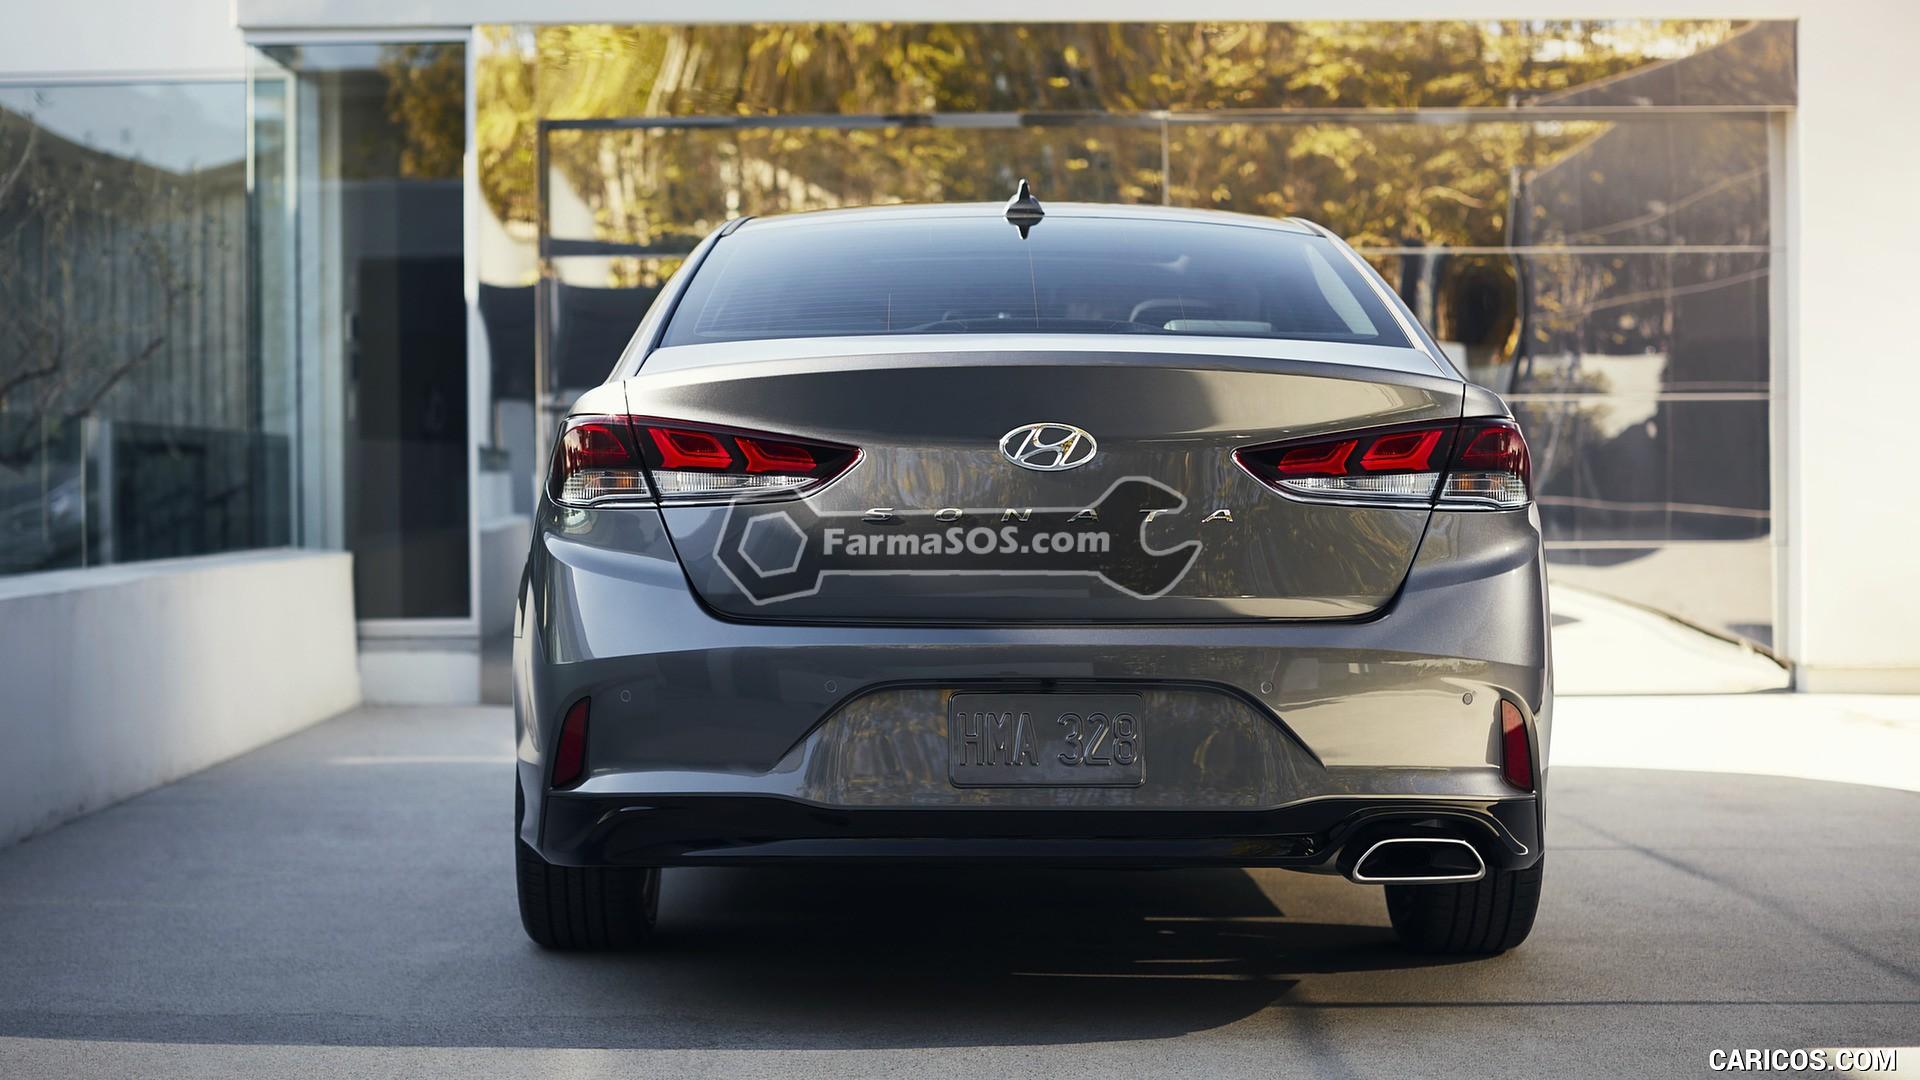 Hyundai Sonata 2018 2019 11 تصاویر هیوندای سوناتا مدل 2018 تا 2019